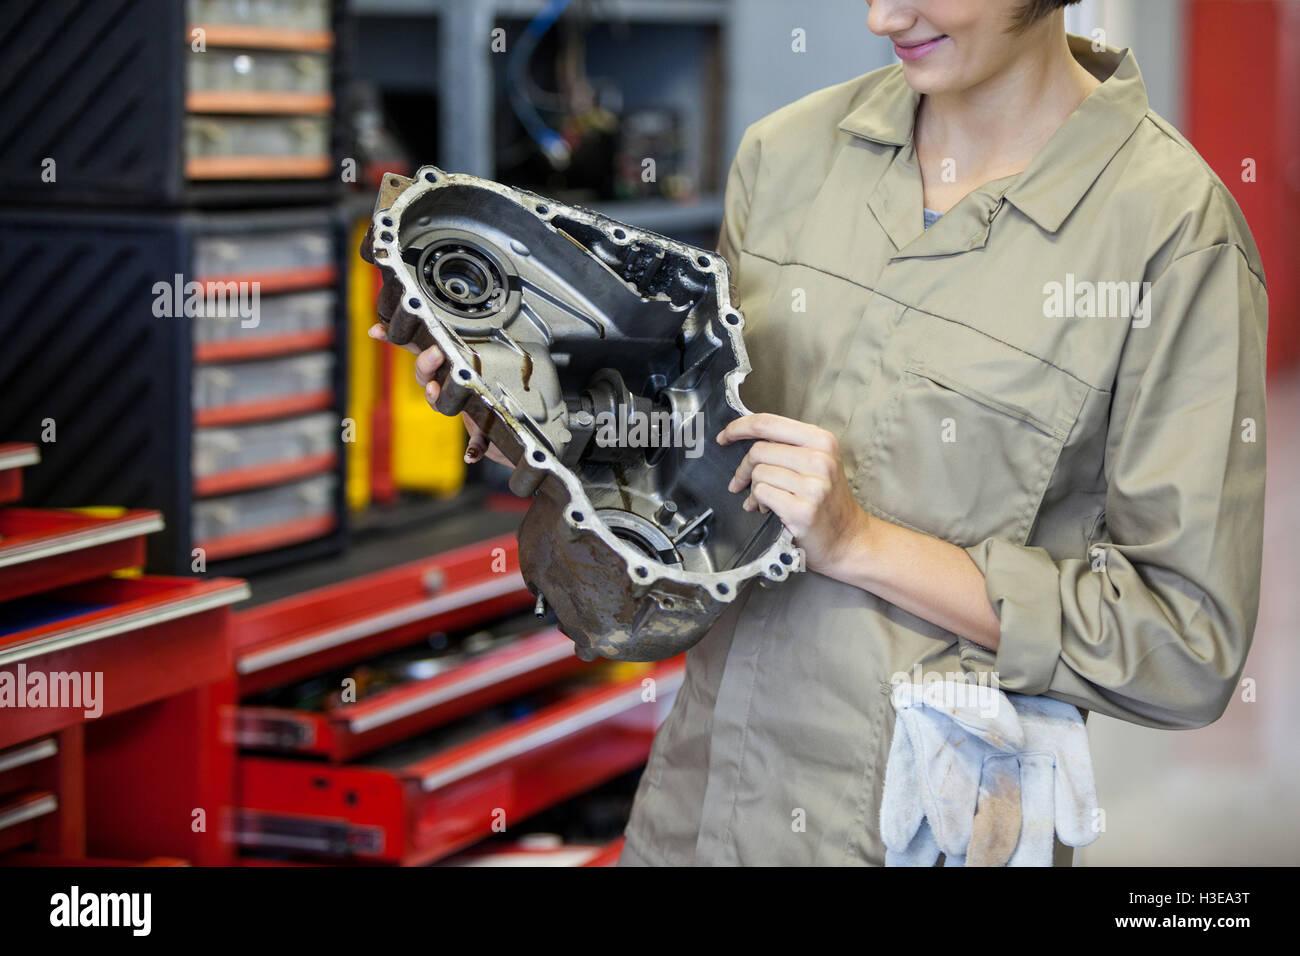 Weibliche Mechaniker Holding Ersatzteile Stockbild